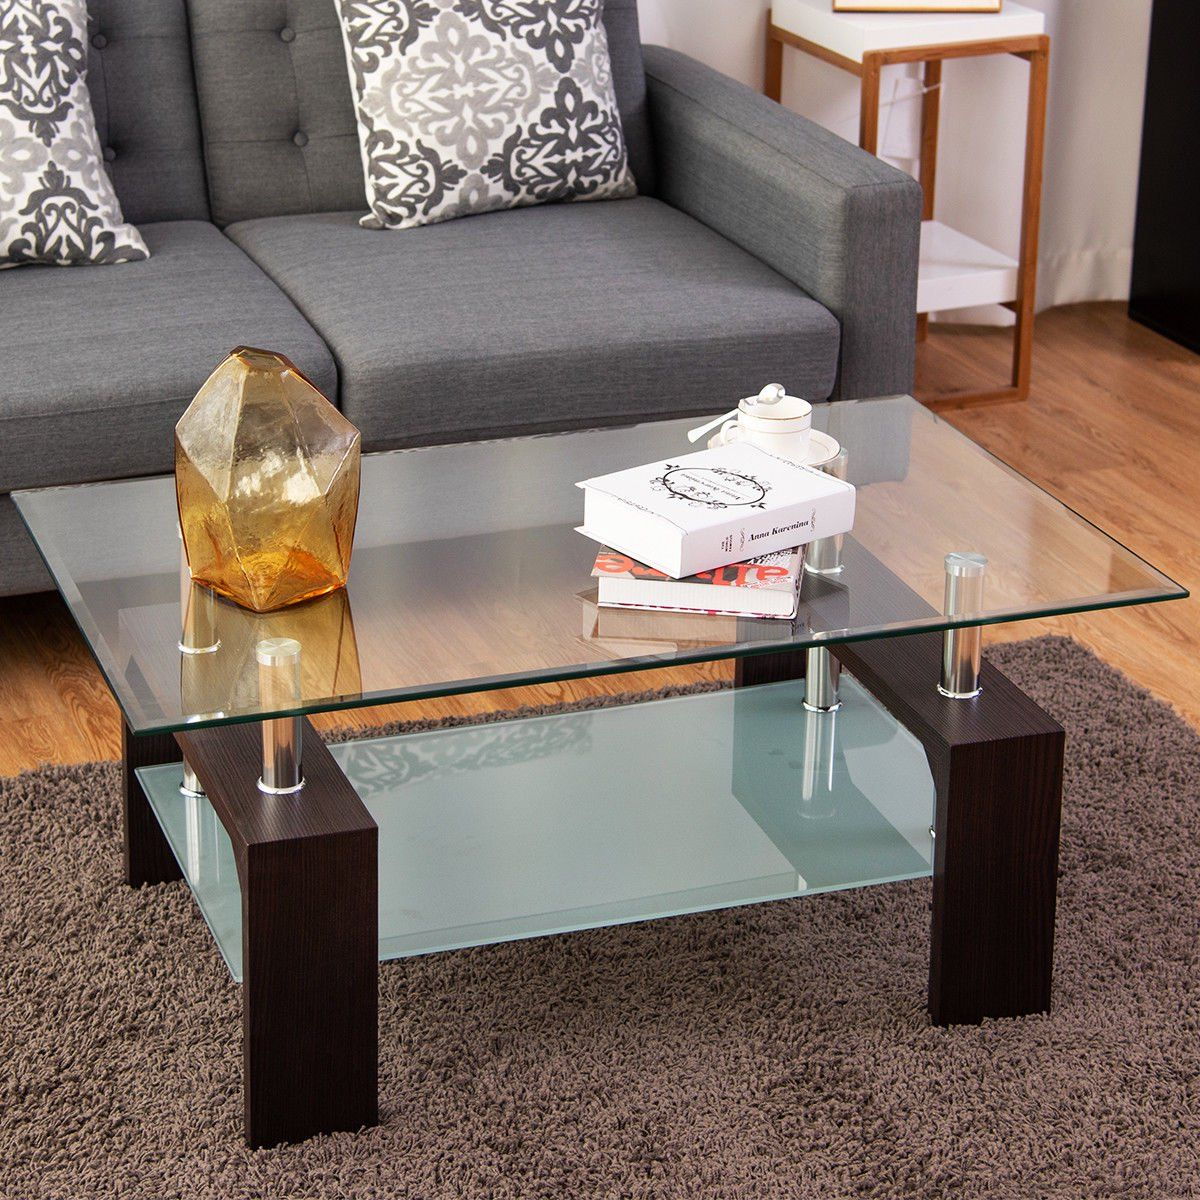 Costway Rectangular Tempered Glass Coffee Table W Shelf Wood Living Room Furniture Walmart Com In 2021 Coffee Table Coffee Table With Shelf Wood Furniture Living Room [ 1200 x 1200 Pixel ]